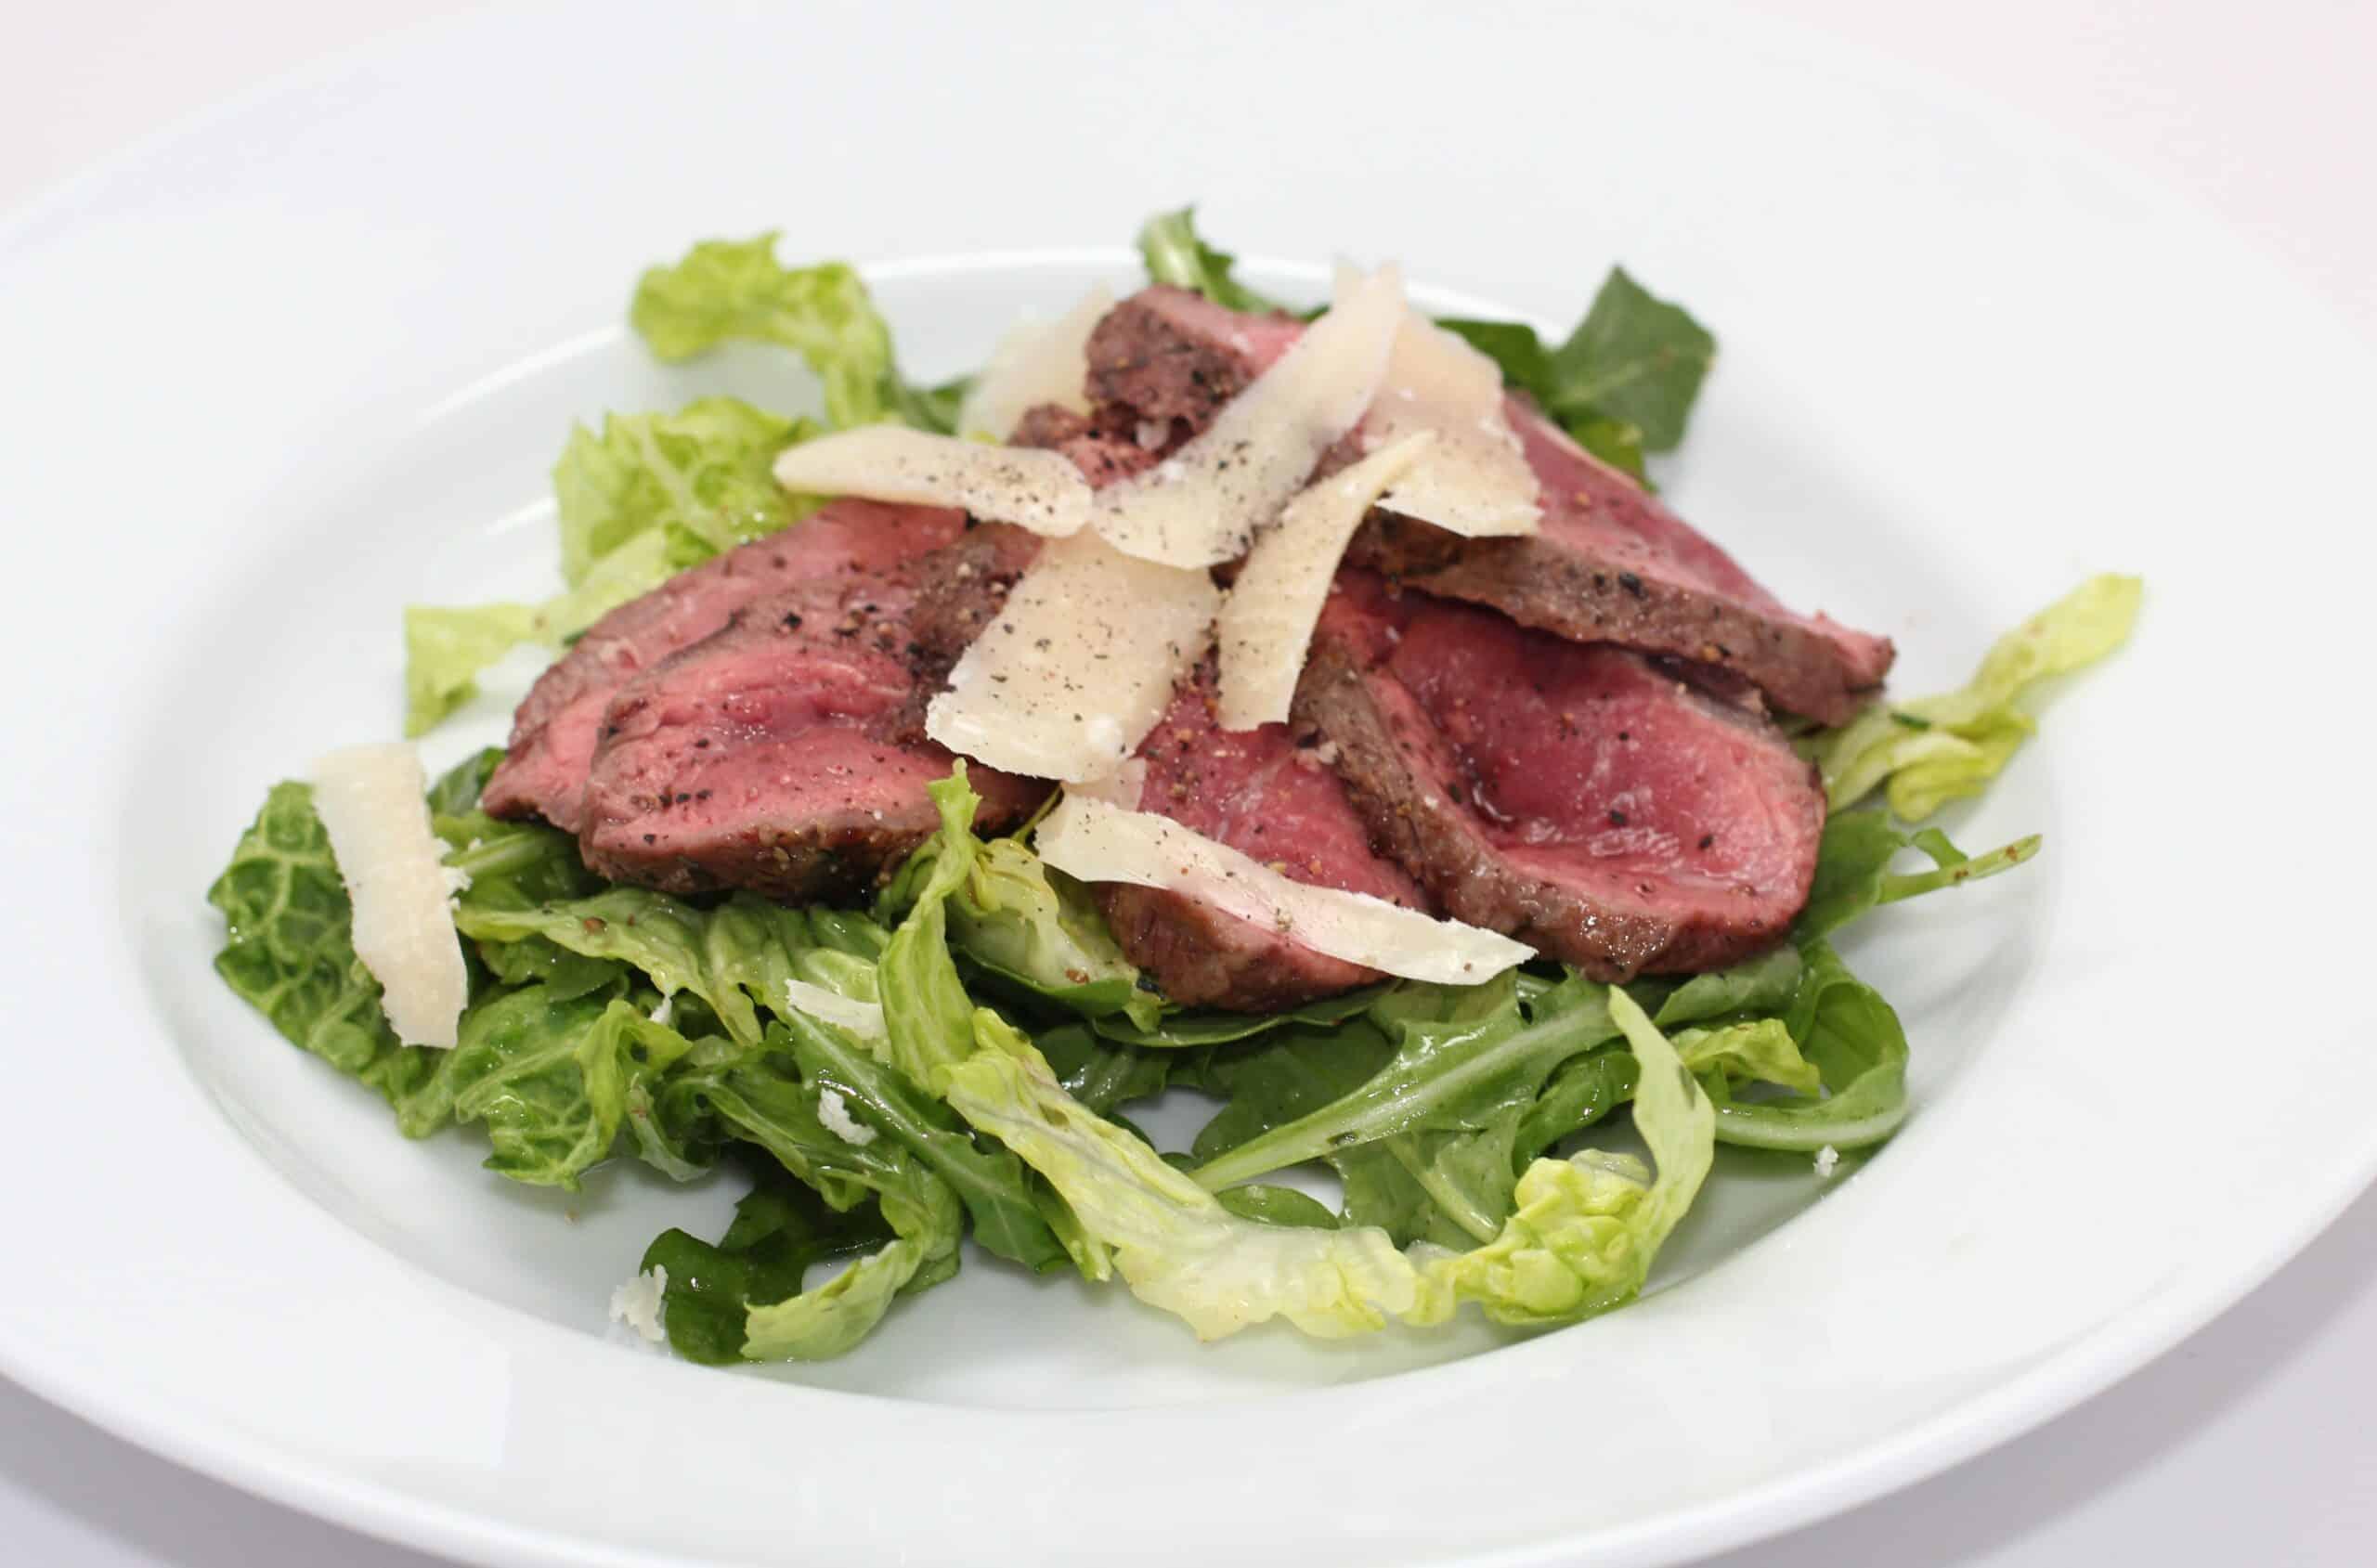 Grilled Steak with Arugula and Parmesan Salad